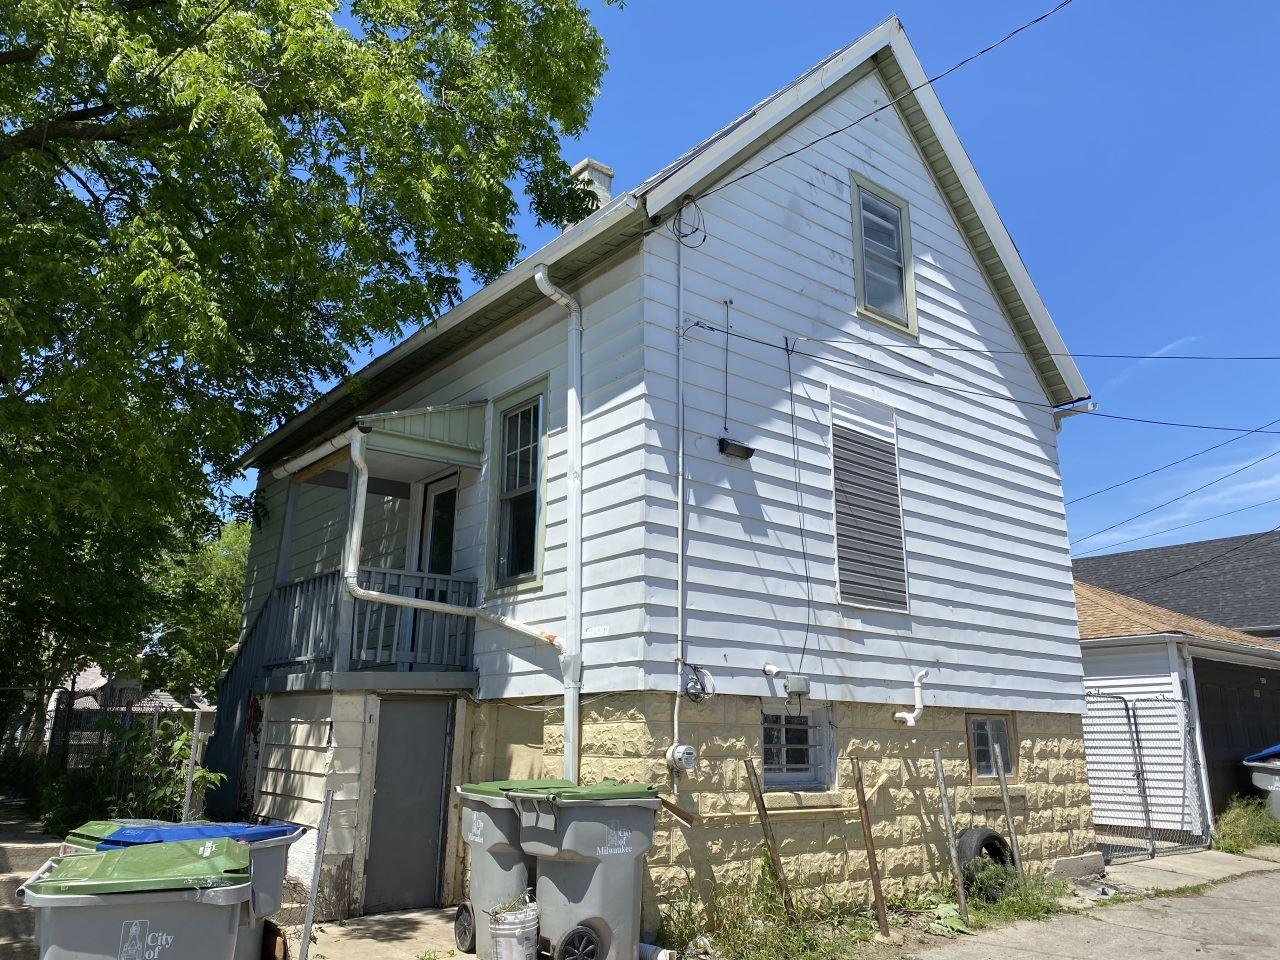 1962 S 12th St, Milwaukee, WI 53204 - #: 1693861